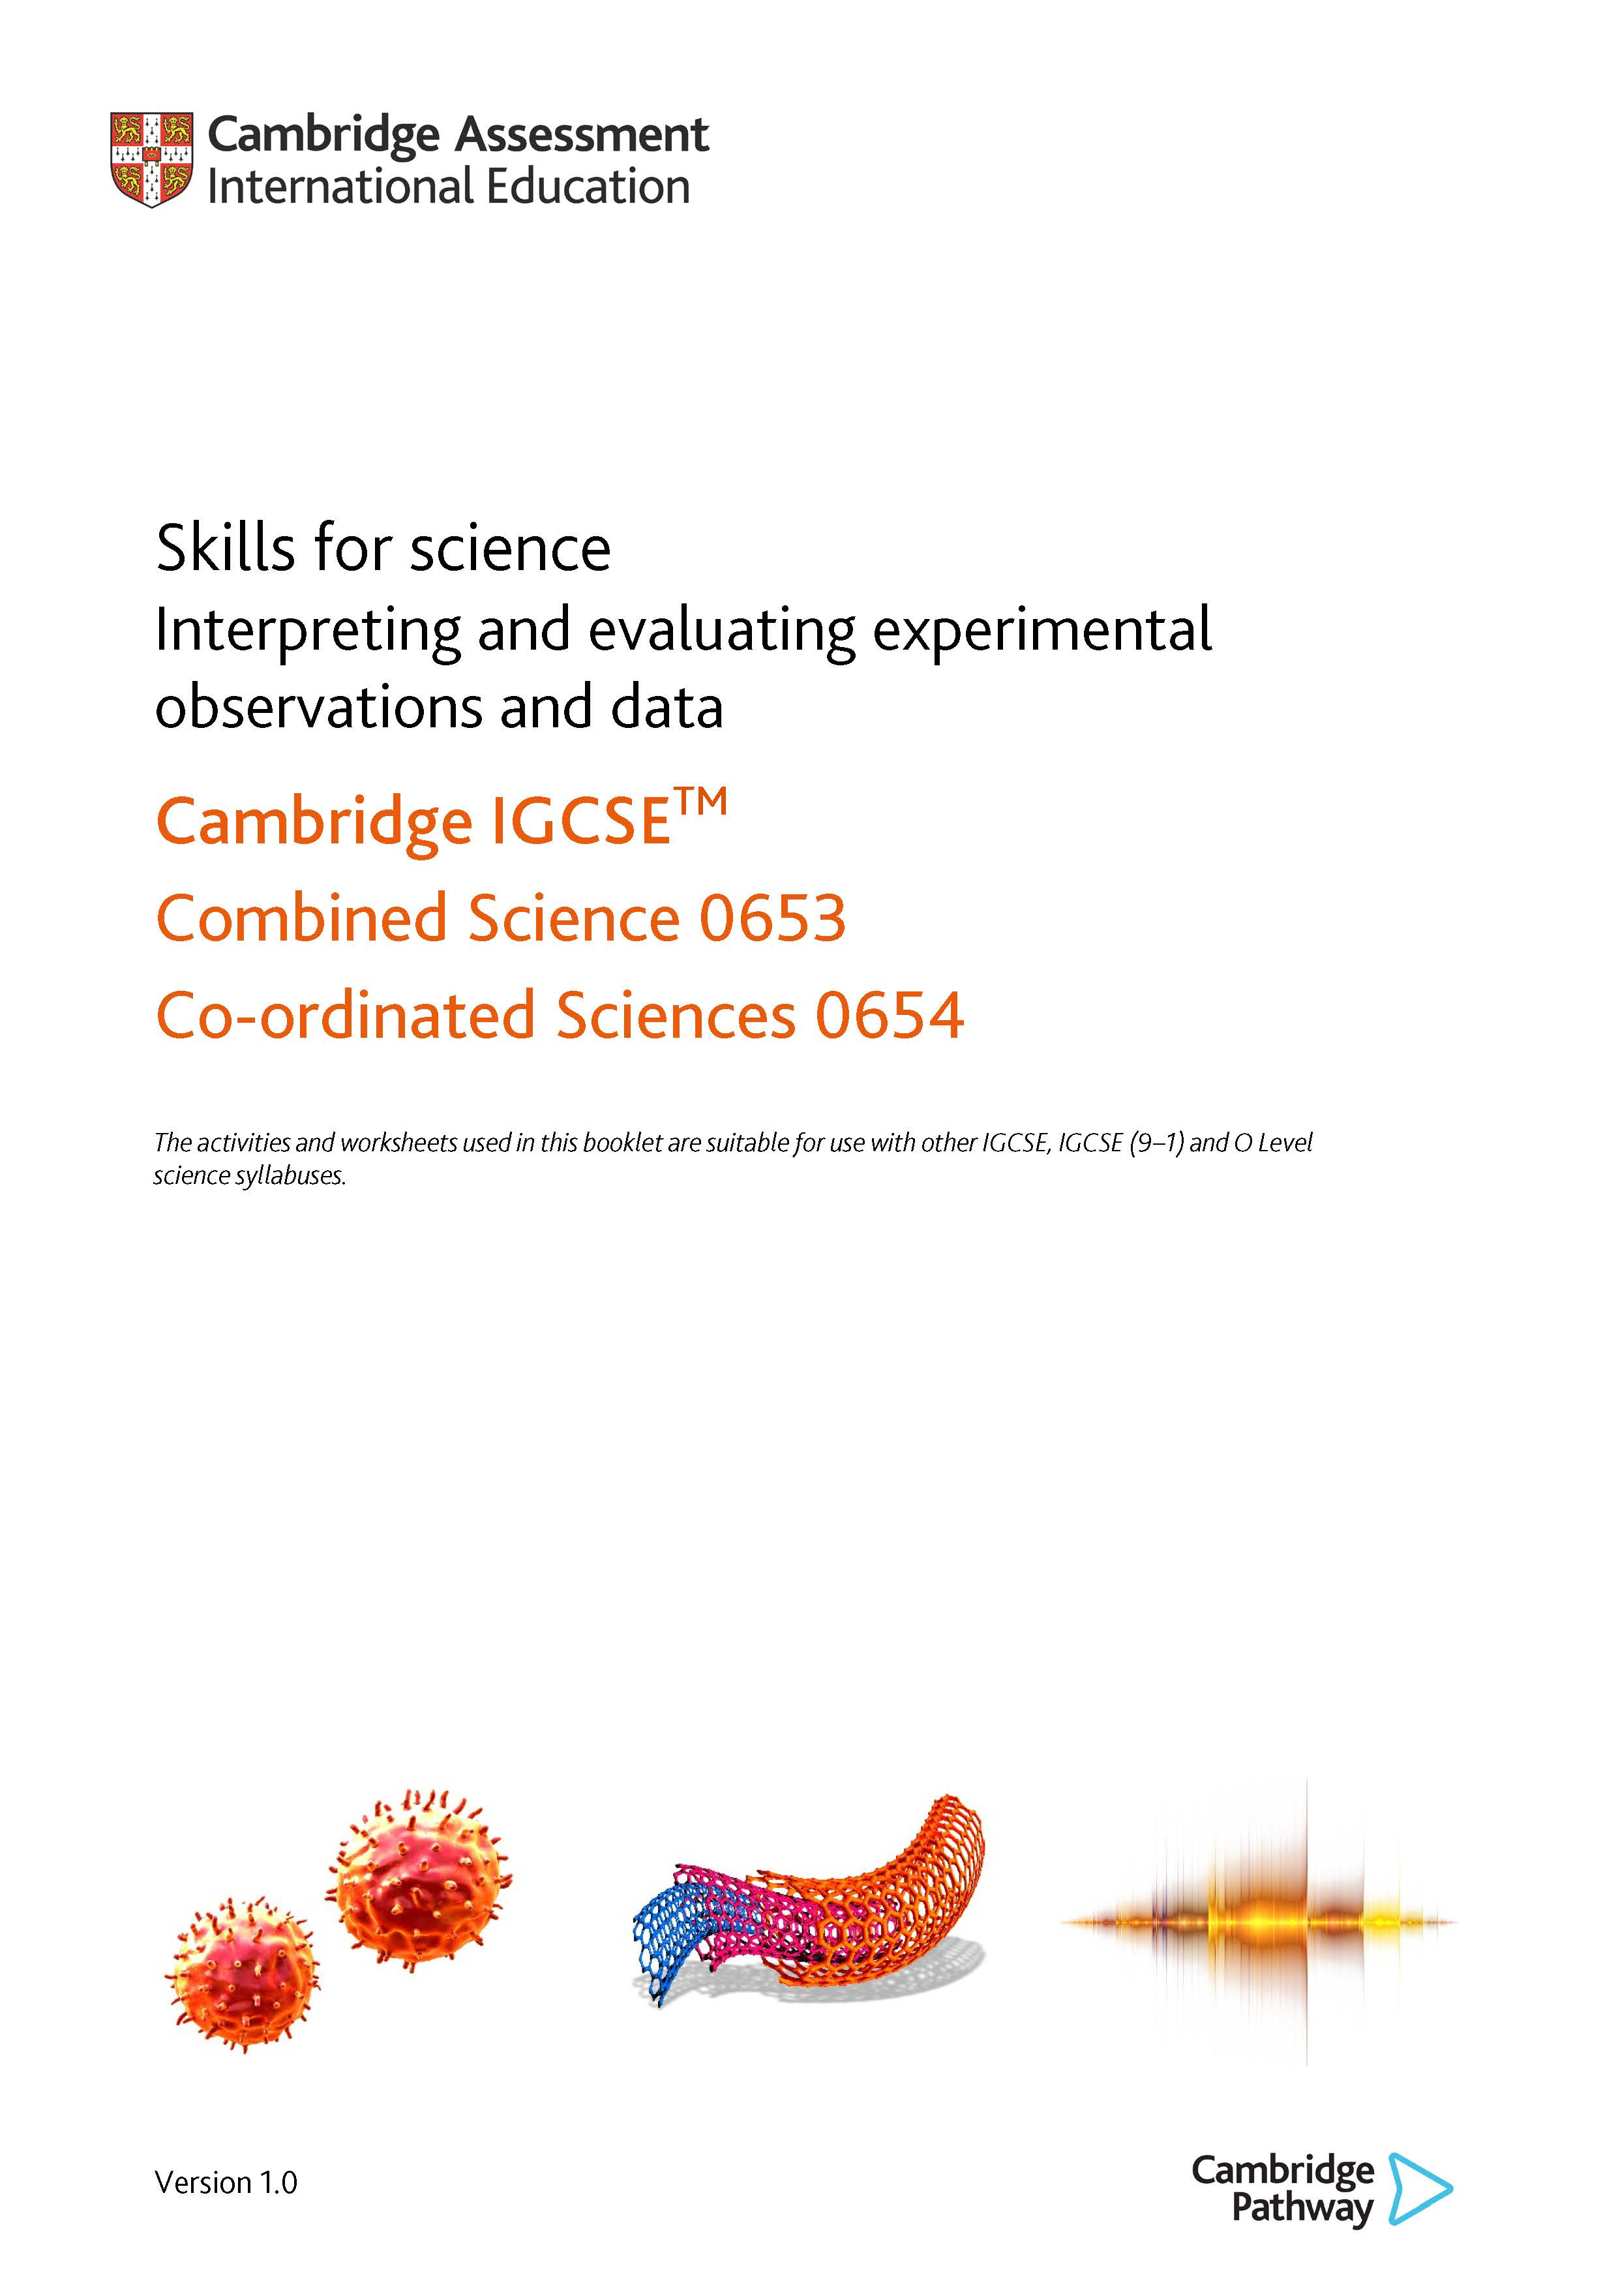 Skills for science - Interpreting